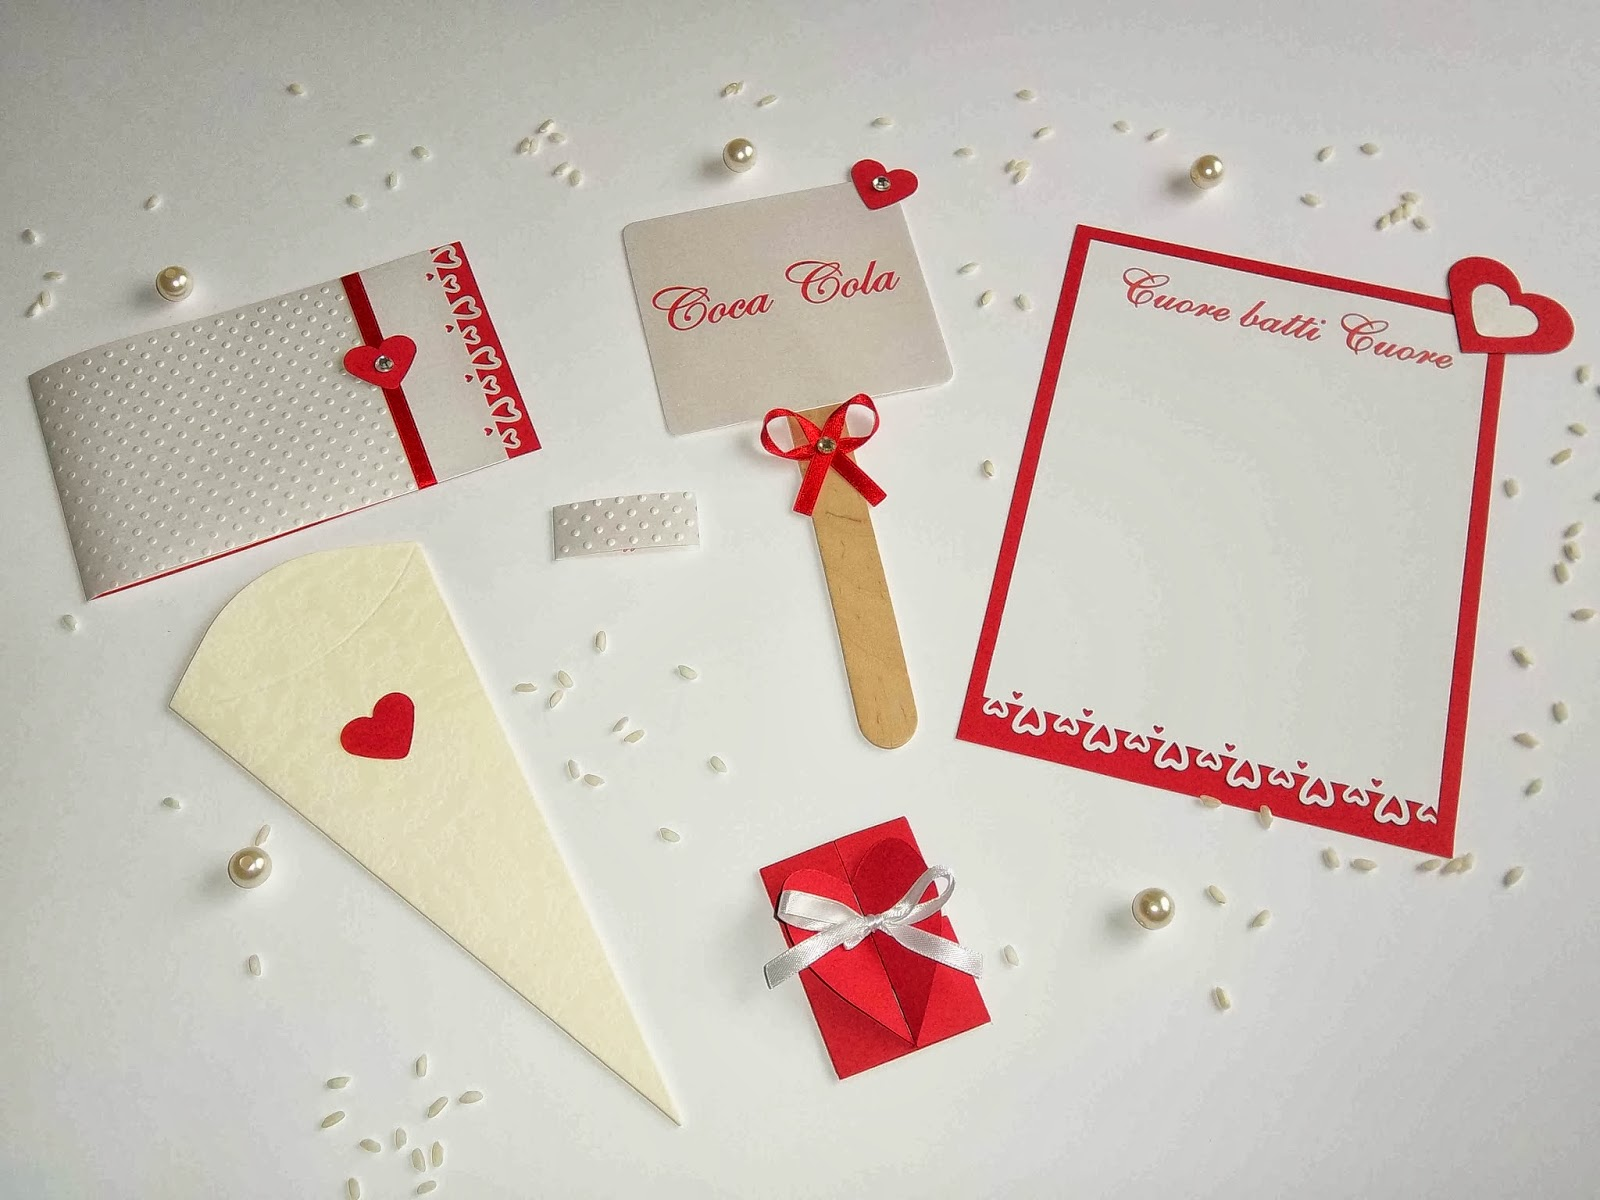 Matrimonio Tema Cuore : Sara crea set coordinato color rosso per matrimoni tema